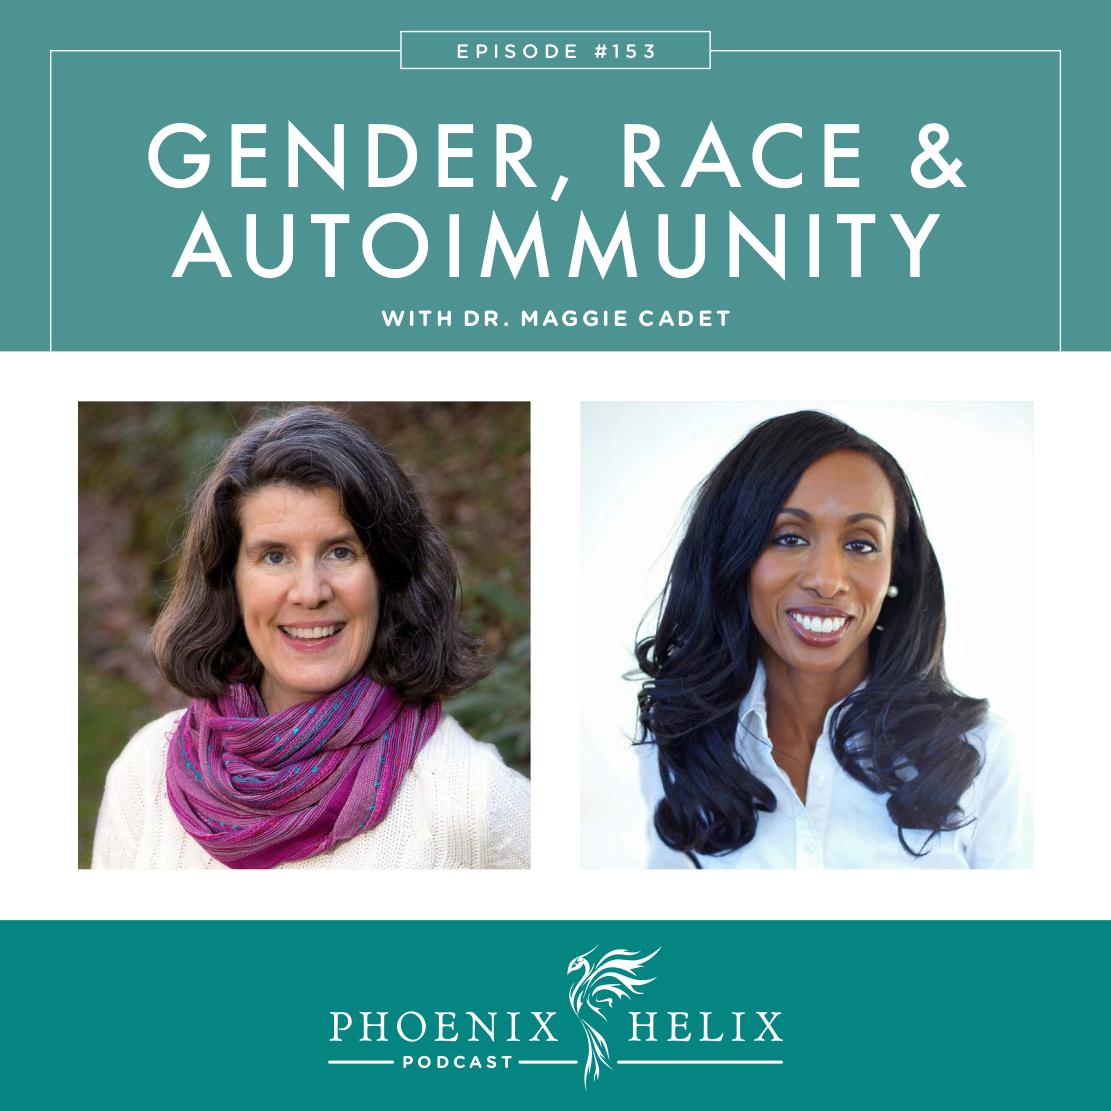 Gender, Race, and Autoimmune Disease with Dr. Maggie Cadet | Phoenix Helix Podcast